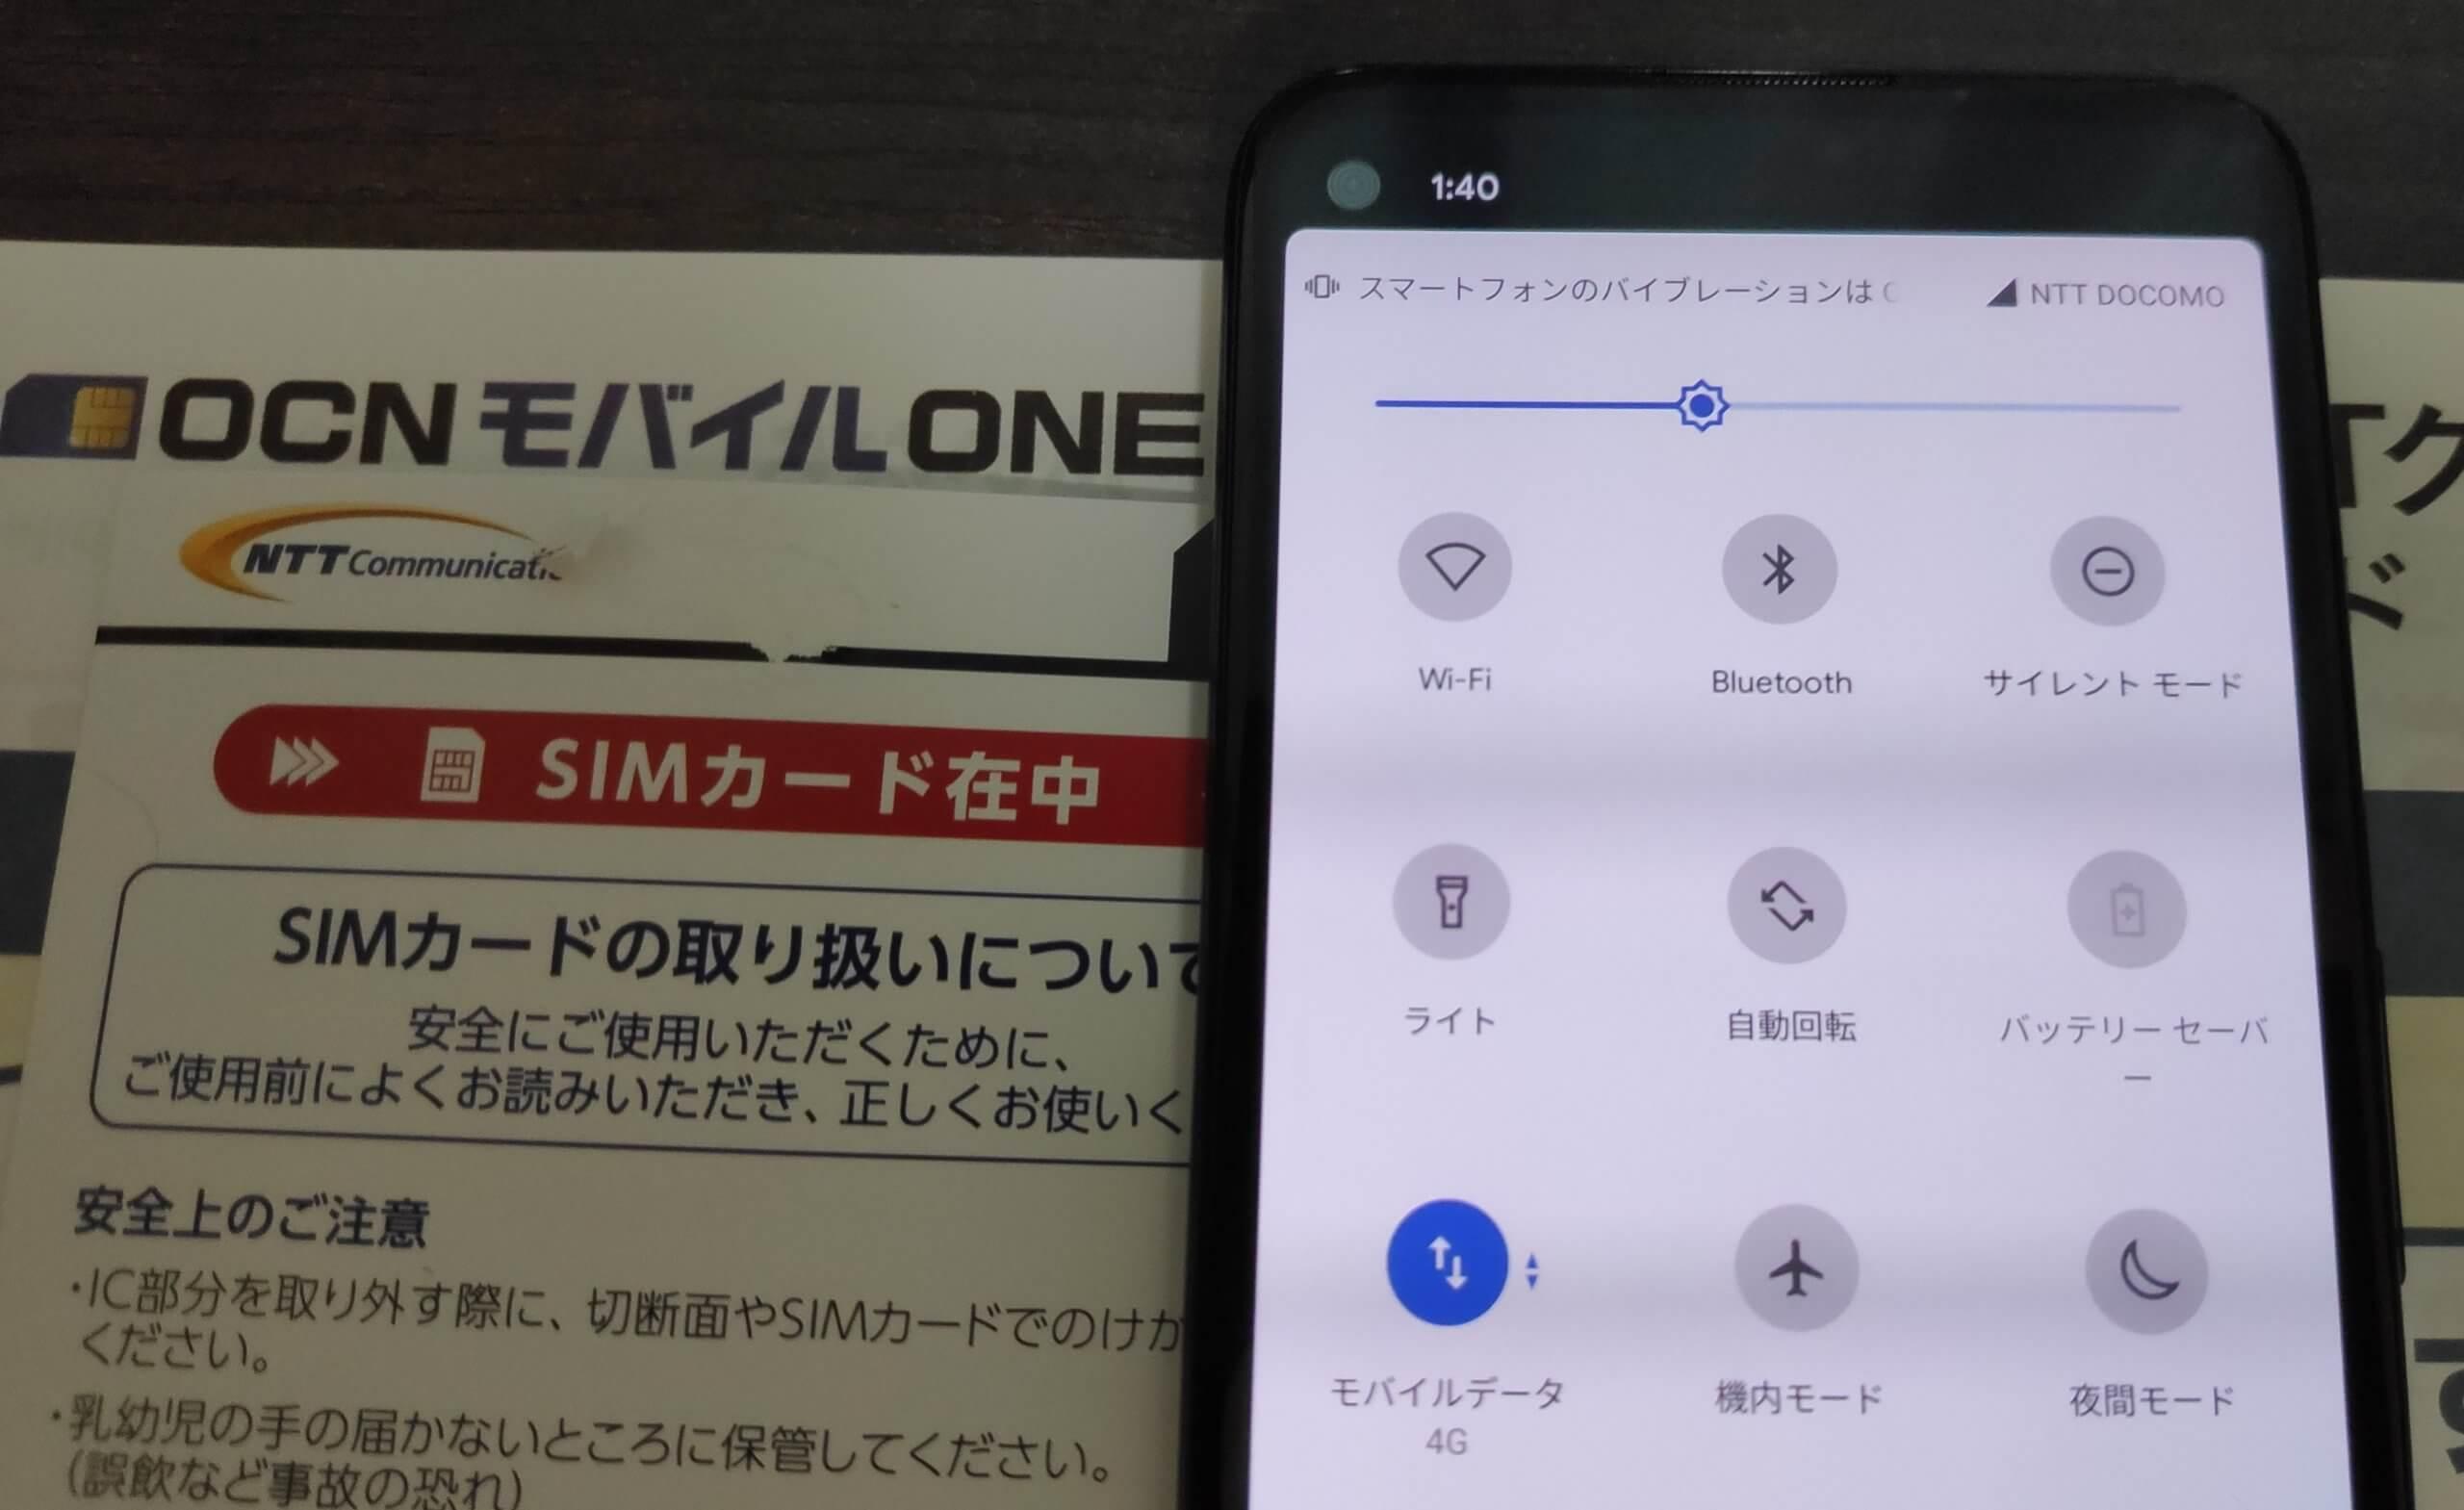 OCNモバイルONEとGoogle Pixel 4a